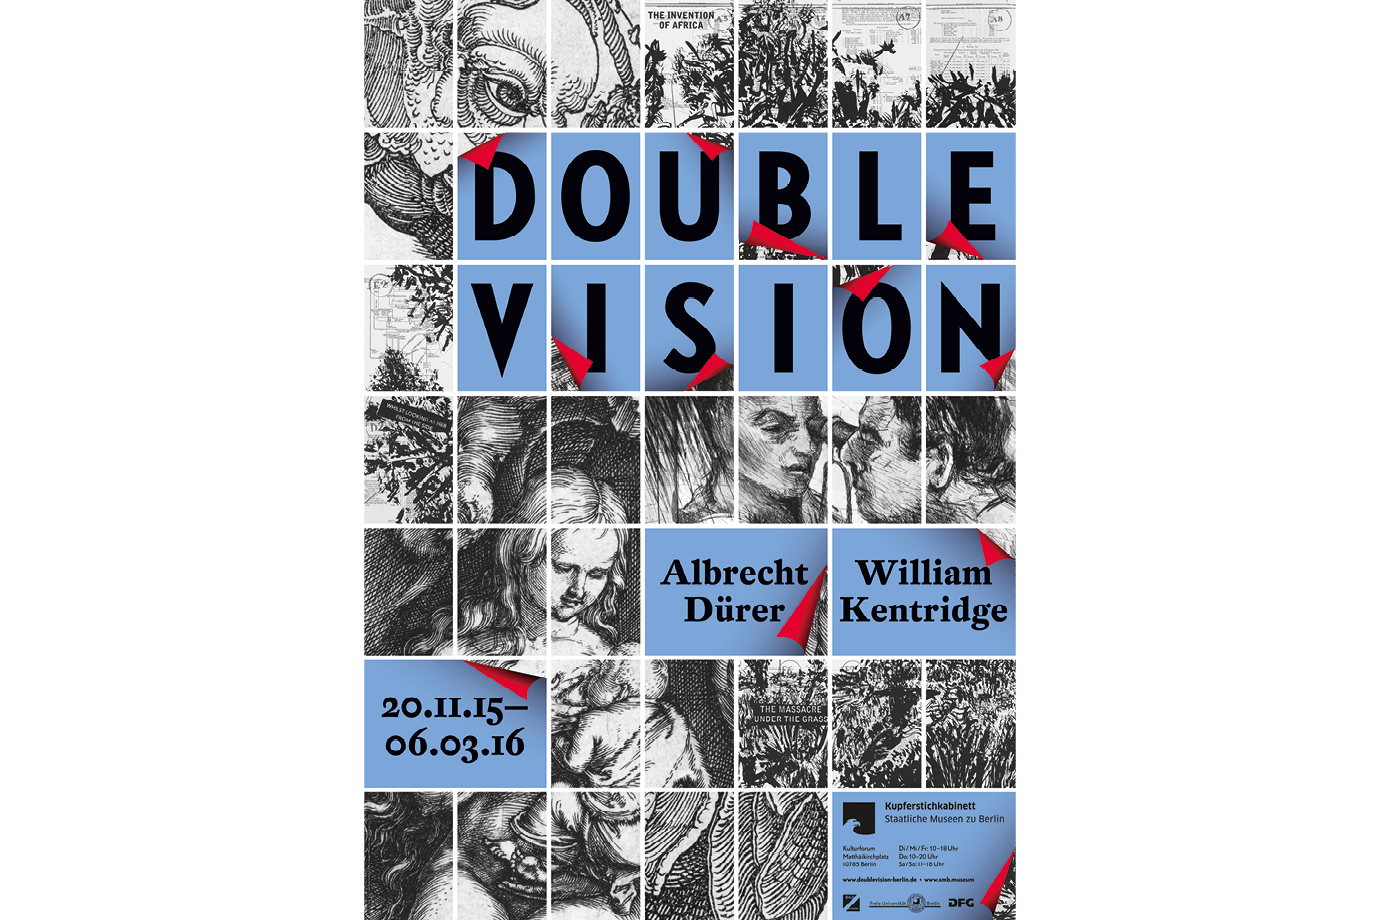 http://e-o-t.de/wordpress/wp-content/uploads/2017/01/2014_eot-DoubleVision-Poster-0.jpg